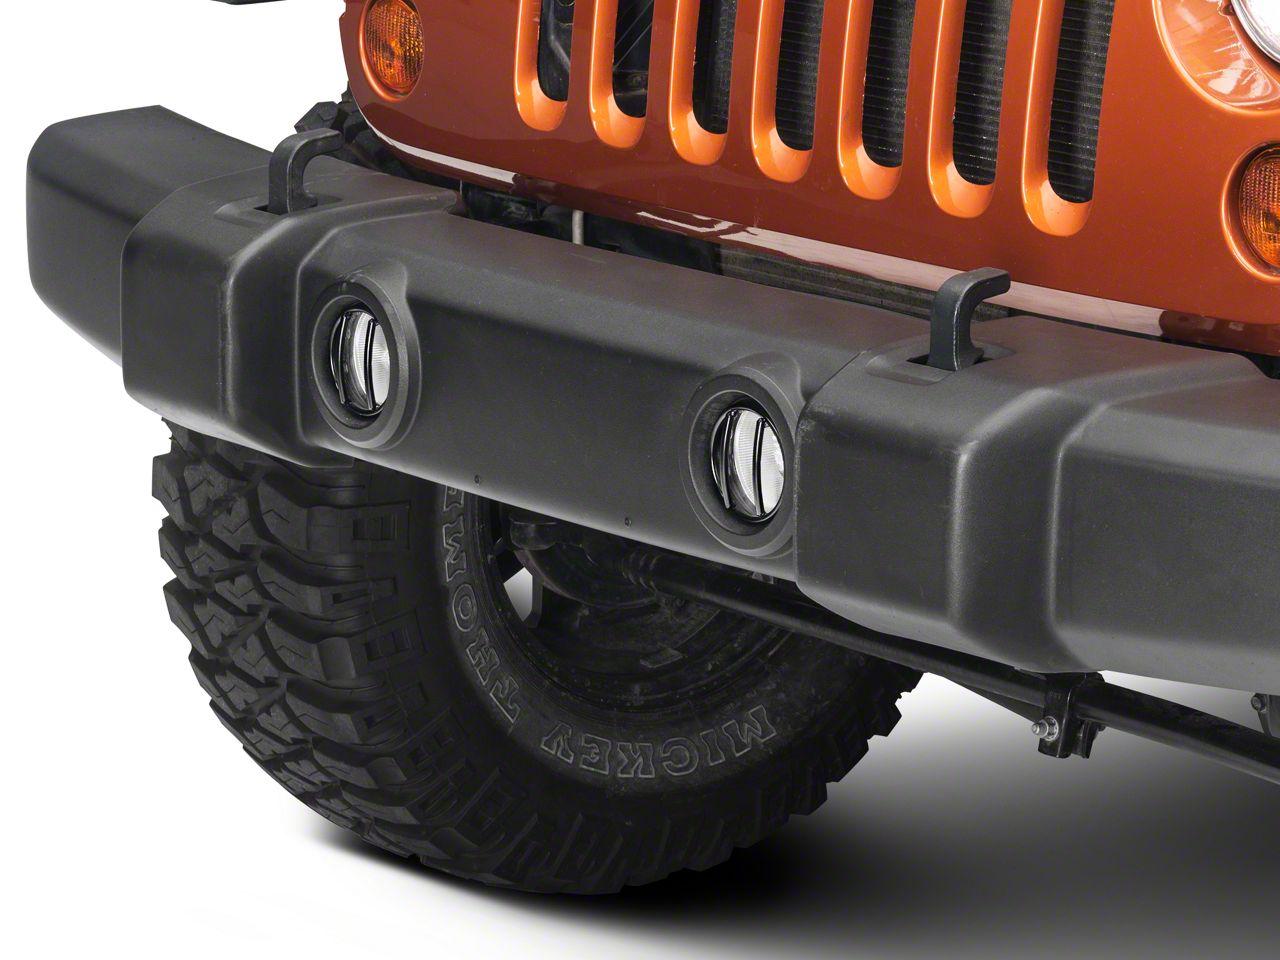 Rugged Ridge Euro Fog Light Guards - Black (07-18 Jeep Wrangler JK)